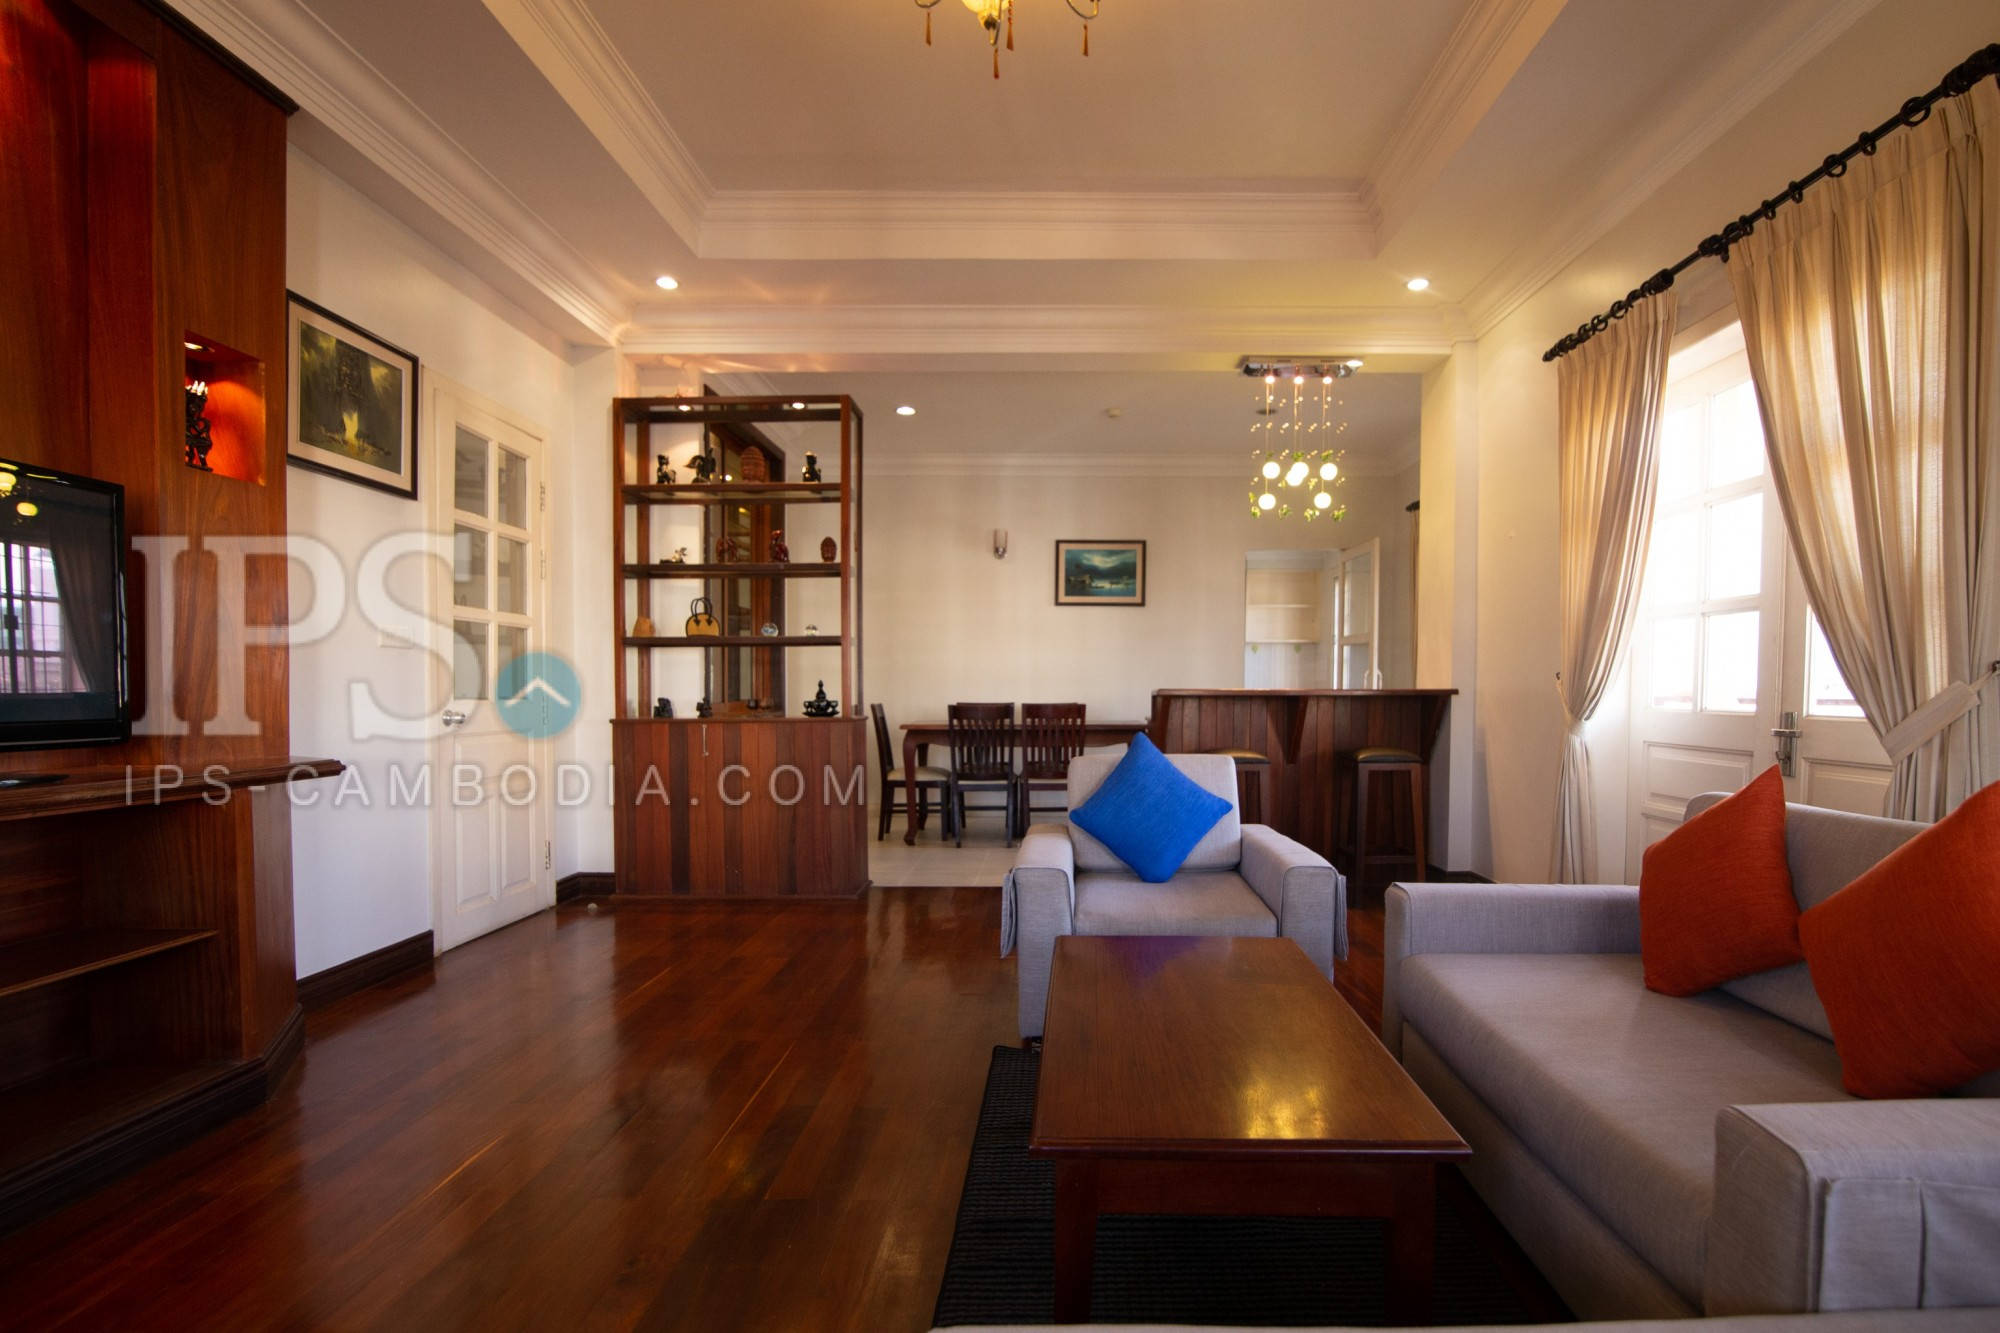 3 Bedroom Apartment For Rent - Toul Kork, Phnom Penh